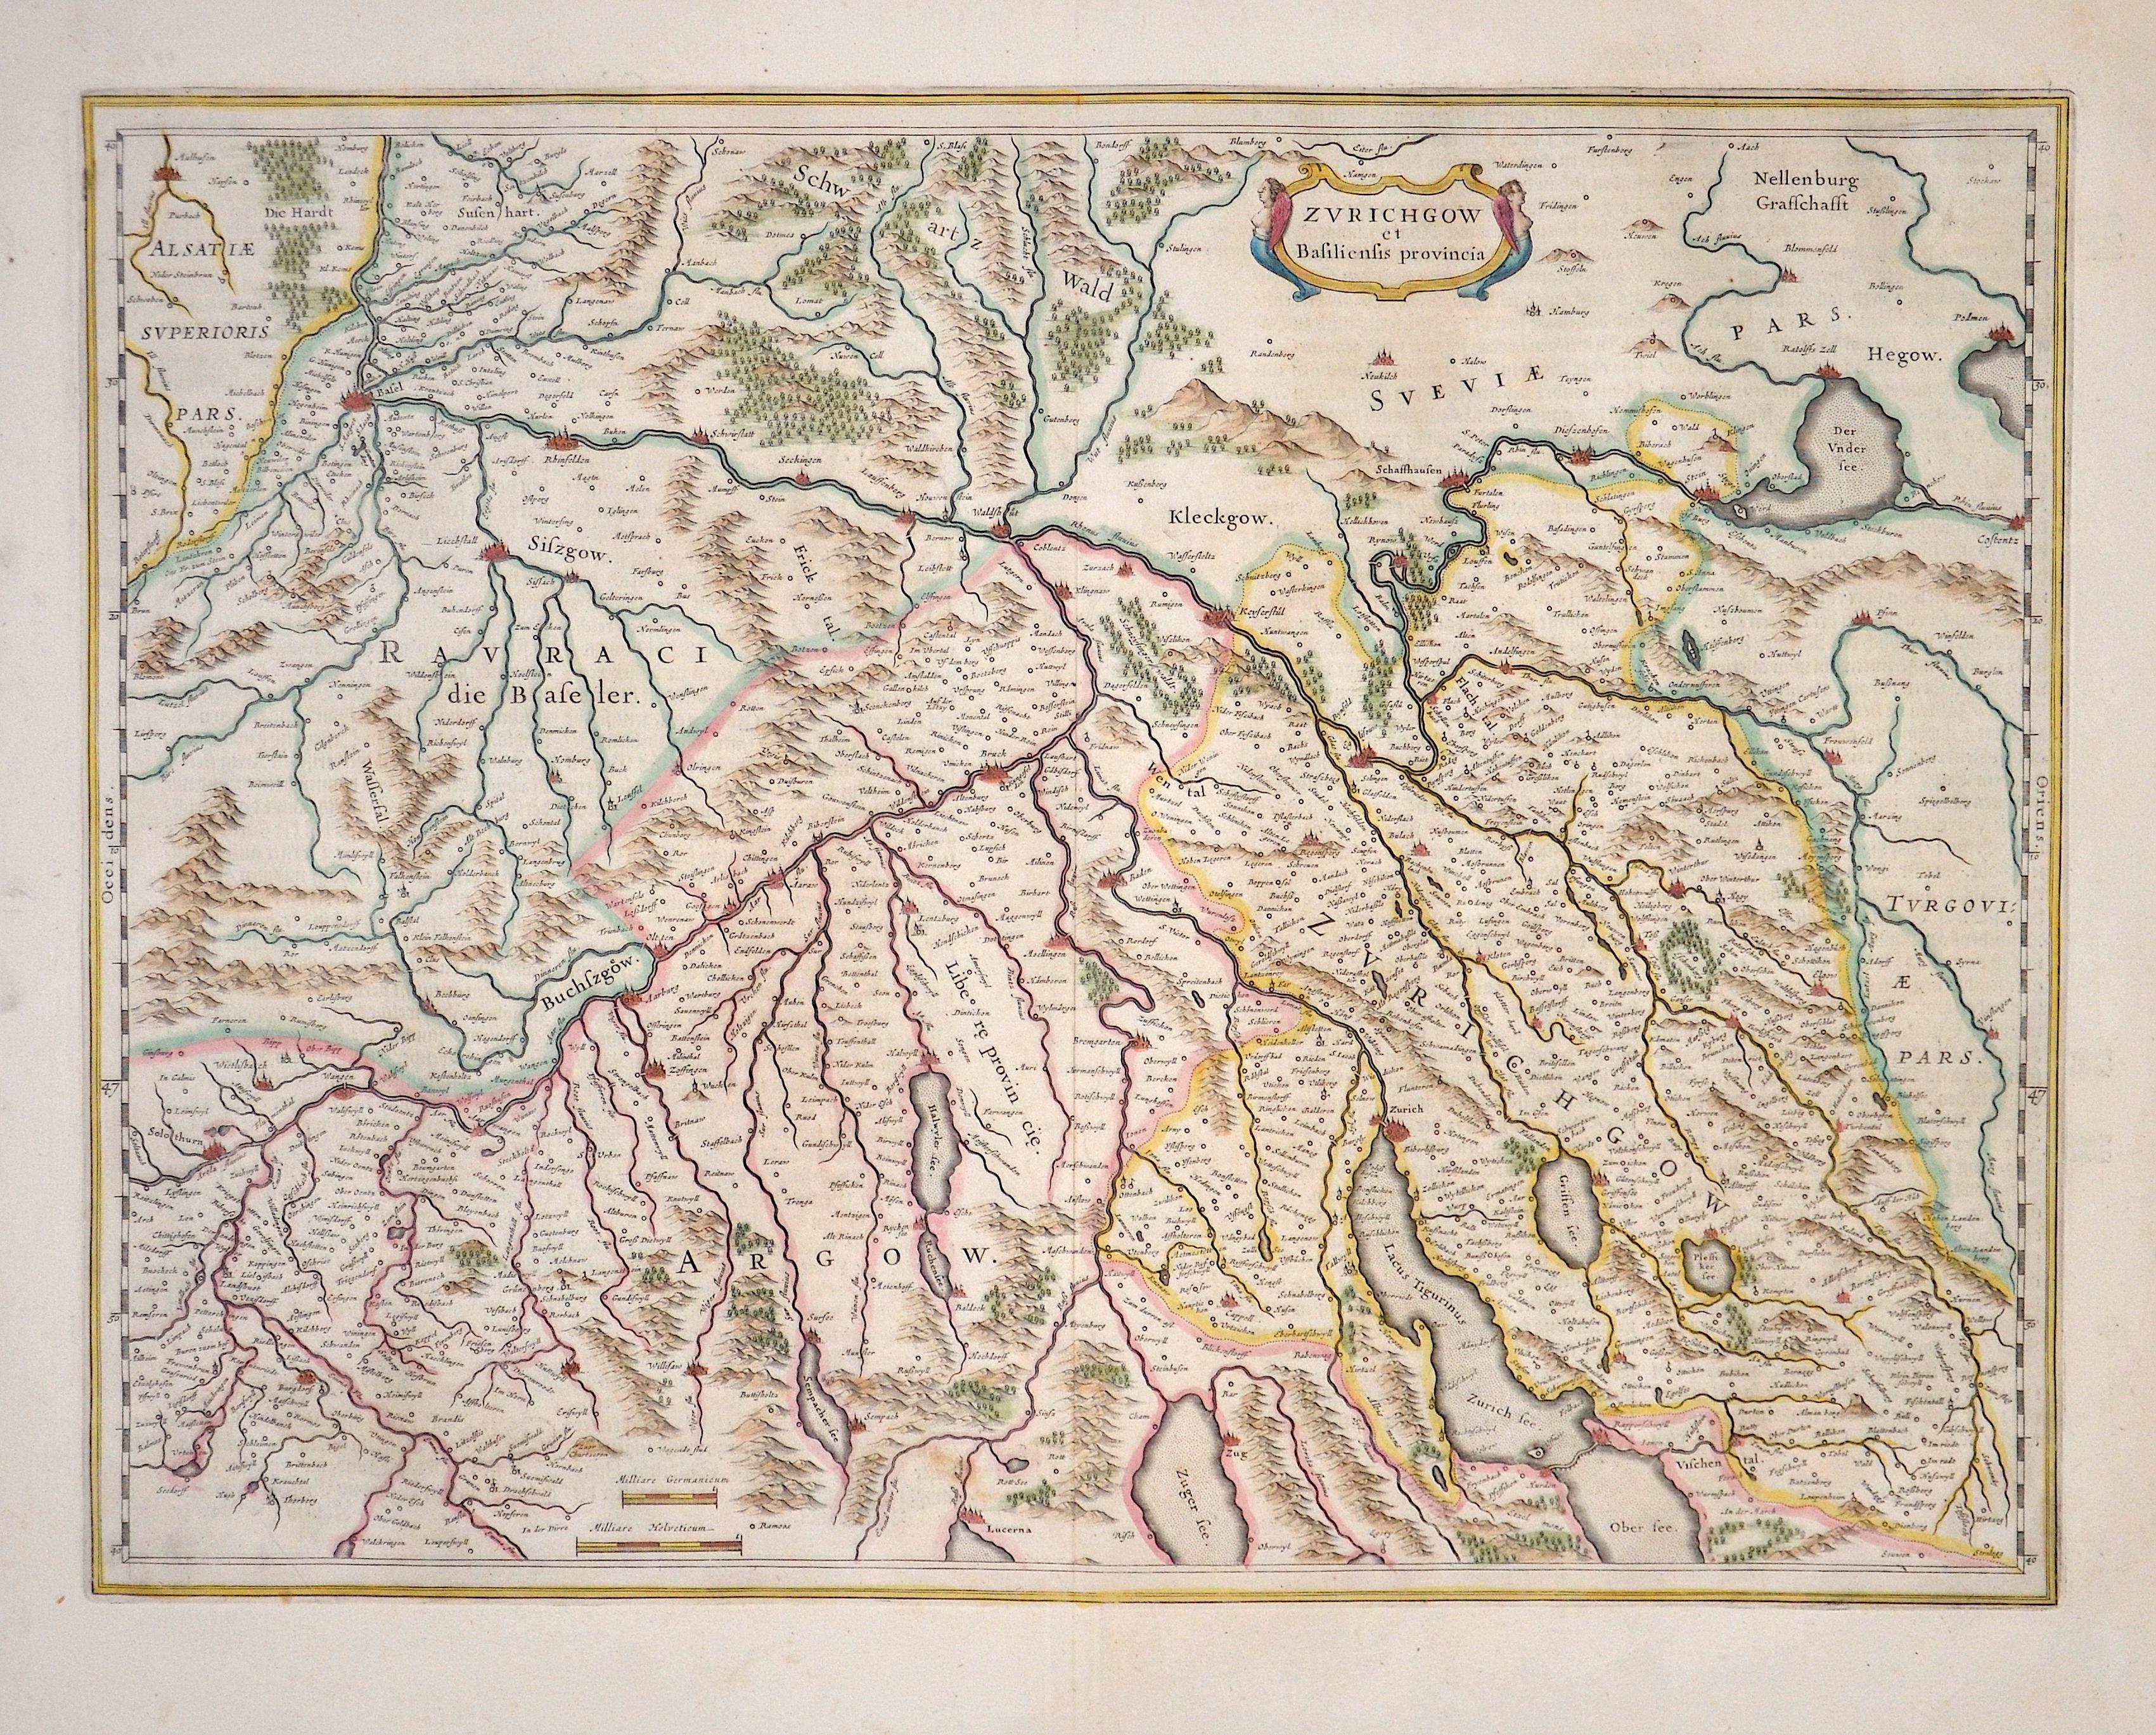 Janssonius Johann Zurichgow et Basiliensis provincia